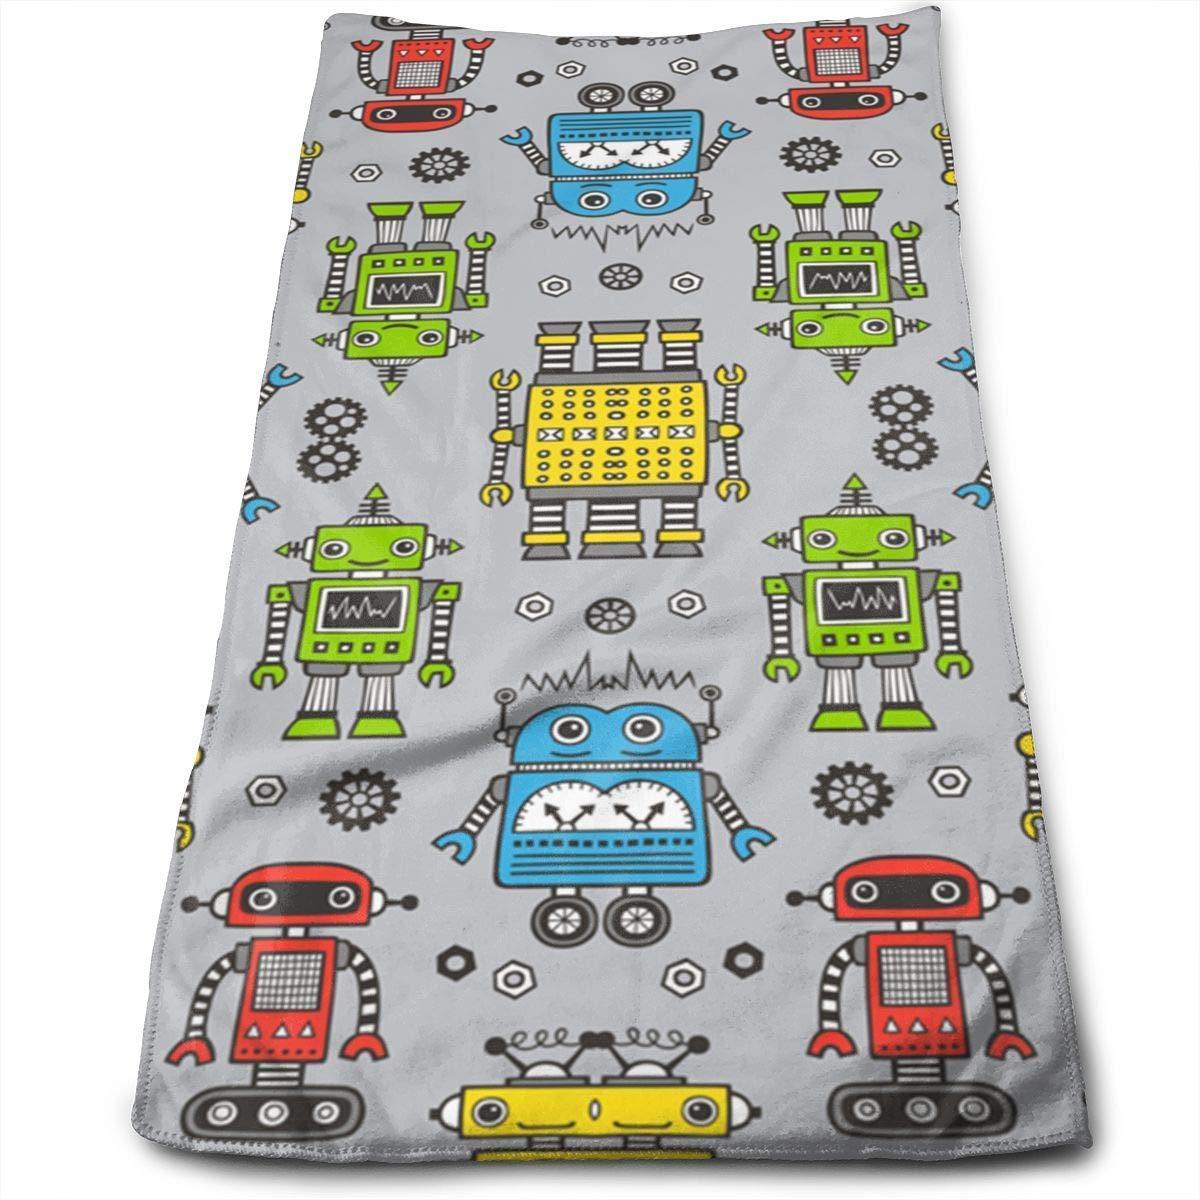 WERERT Eco-Friendly Cute Robots On Gray Microfiber Hand Towels,Super Absorbency,Multipurpose,Quick Drying,Maimum Softness,Machine